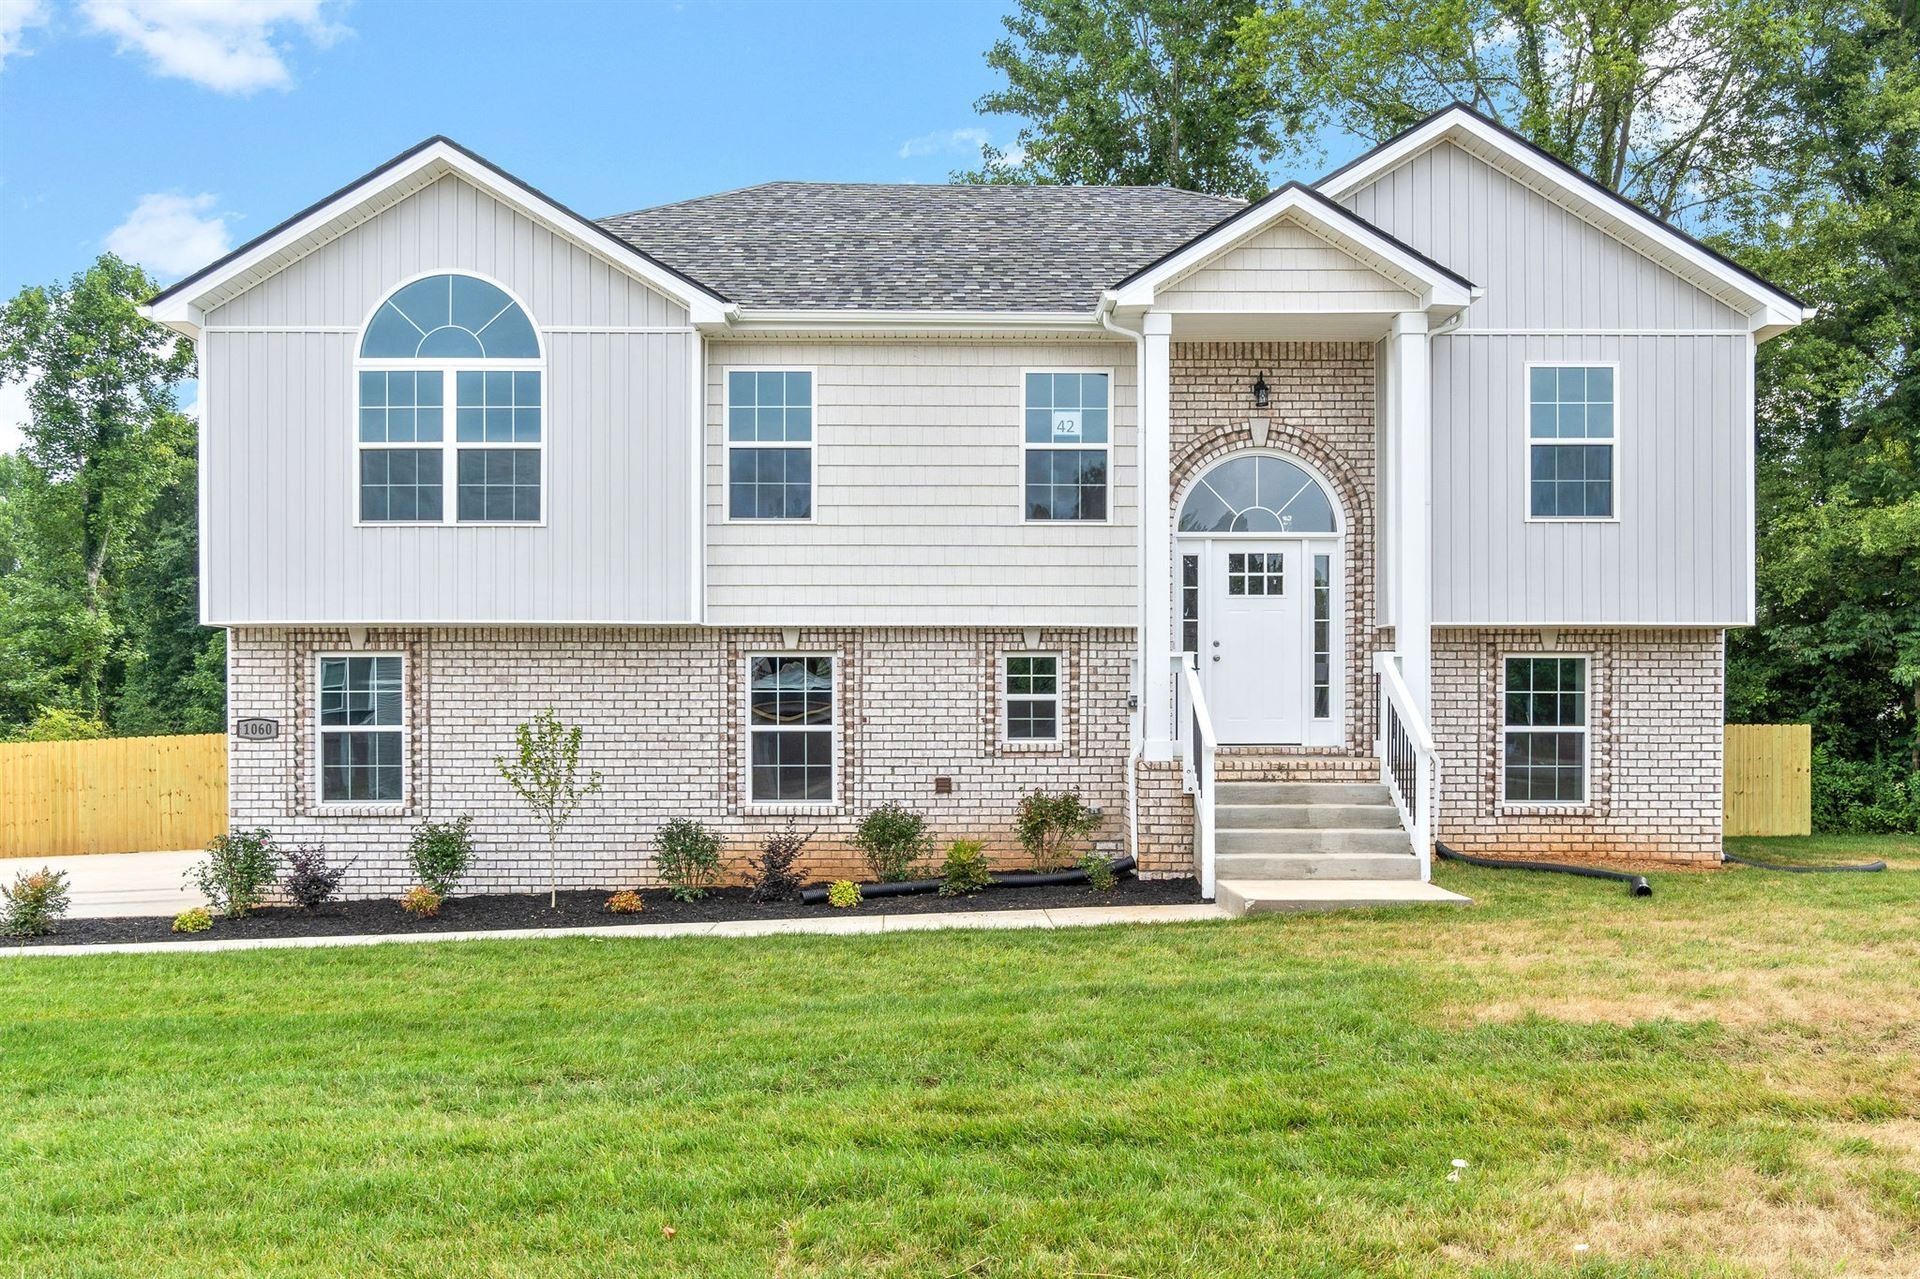 86 Dunbar, Clarksville, TN 37043 - MLS#: 2190005